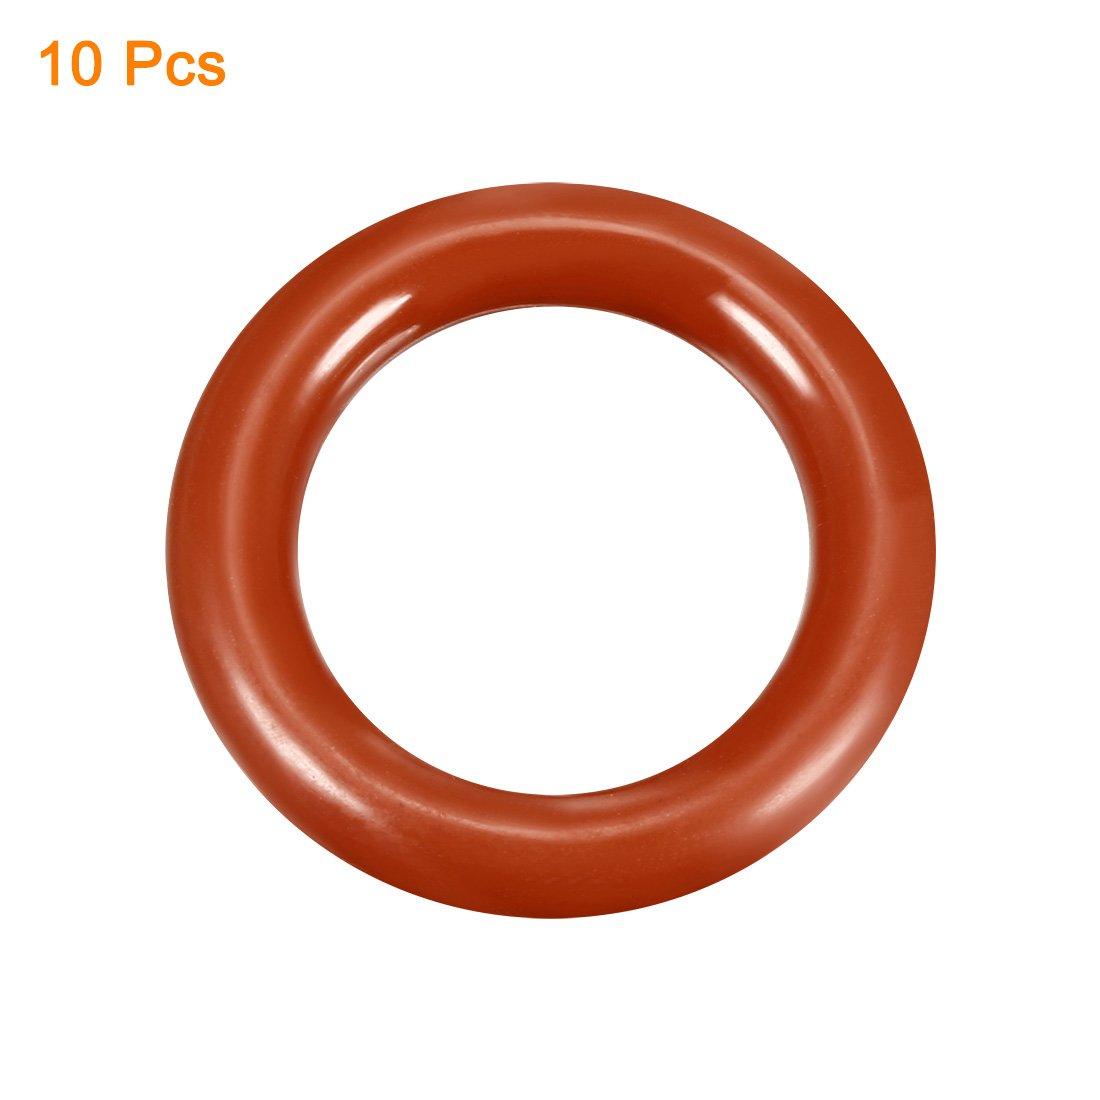 sourcing map 10pcs Silikon O-Ring VMQ Siegel Ring Dichtung Rot 25mmx18mmx3,5mm DE de